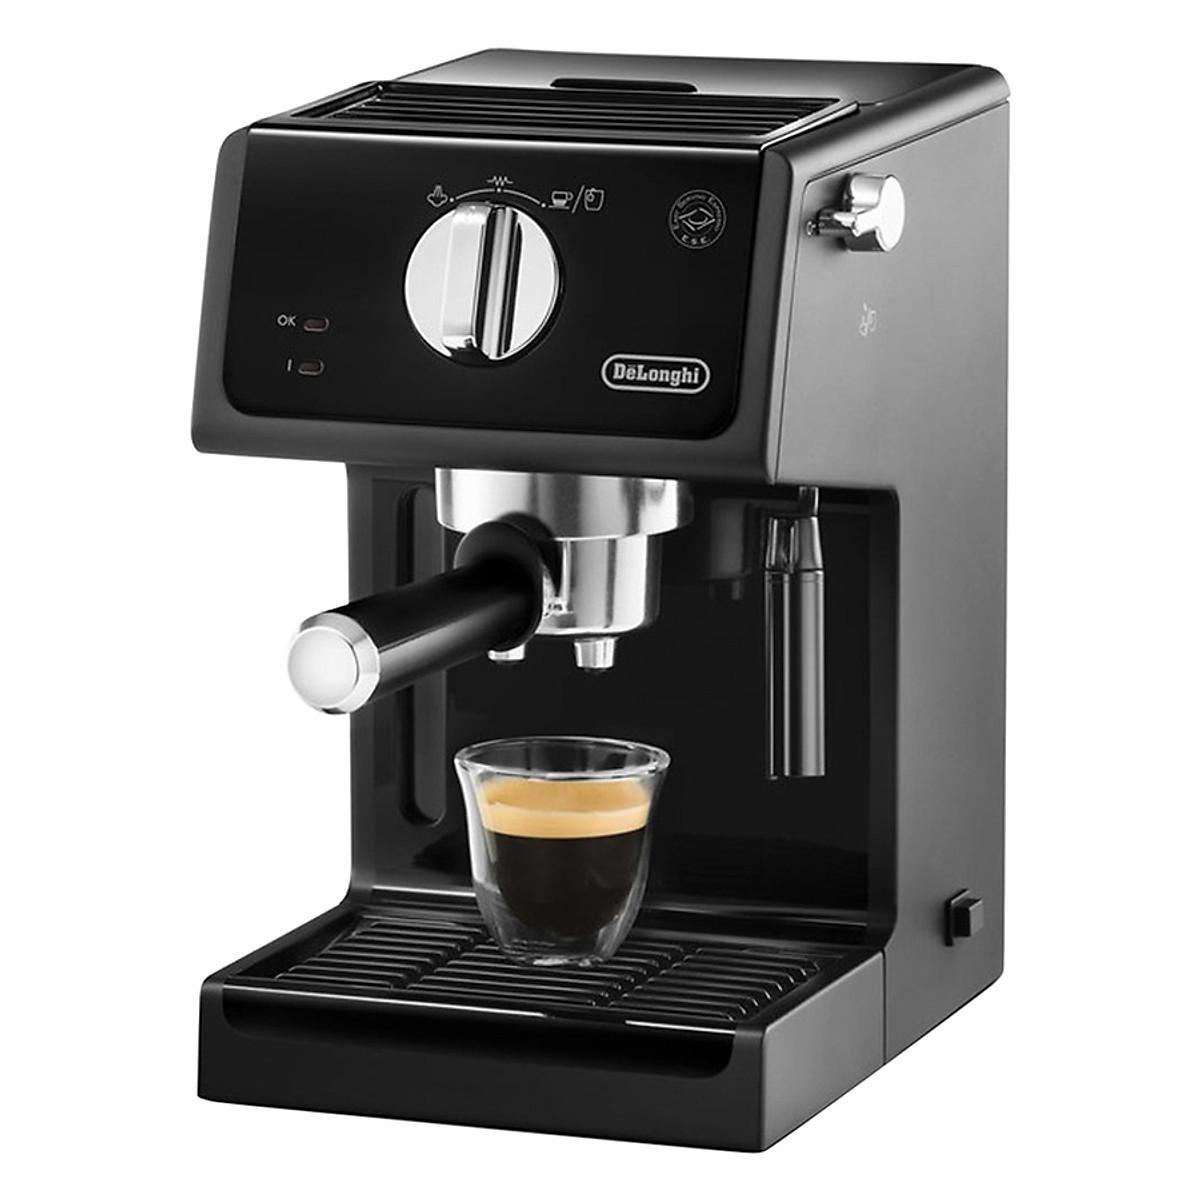 Đánh giá chi tiết Máy pha cafe Espresso DELONGHI ECP31.21 1100W